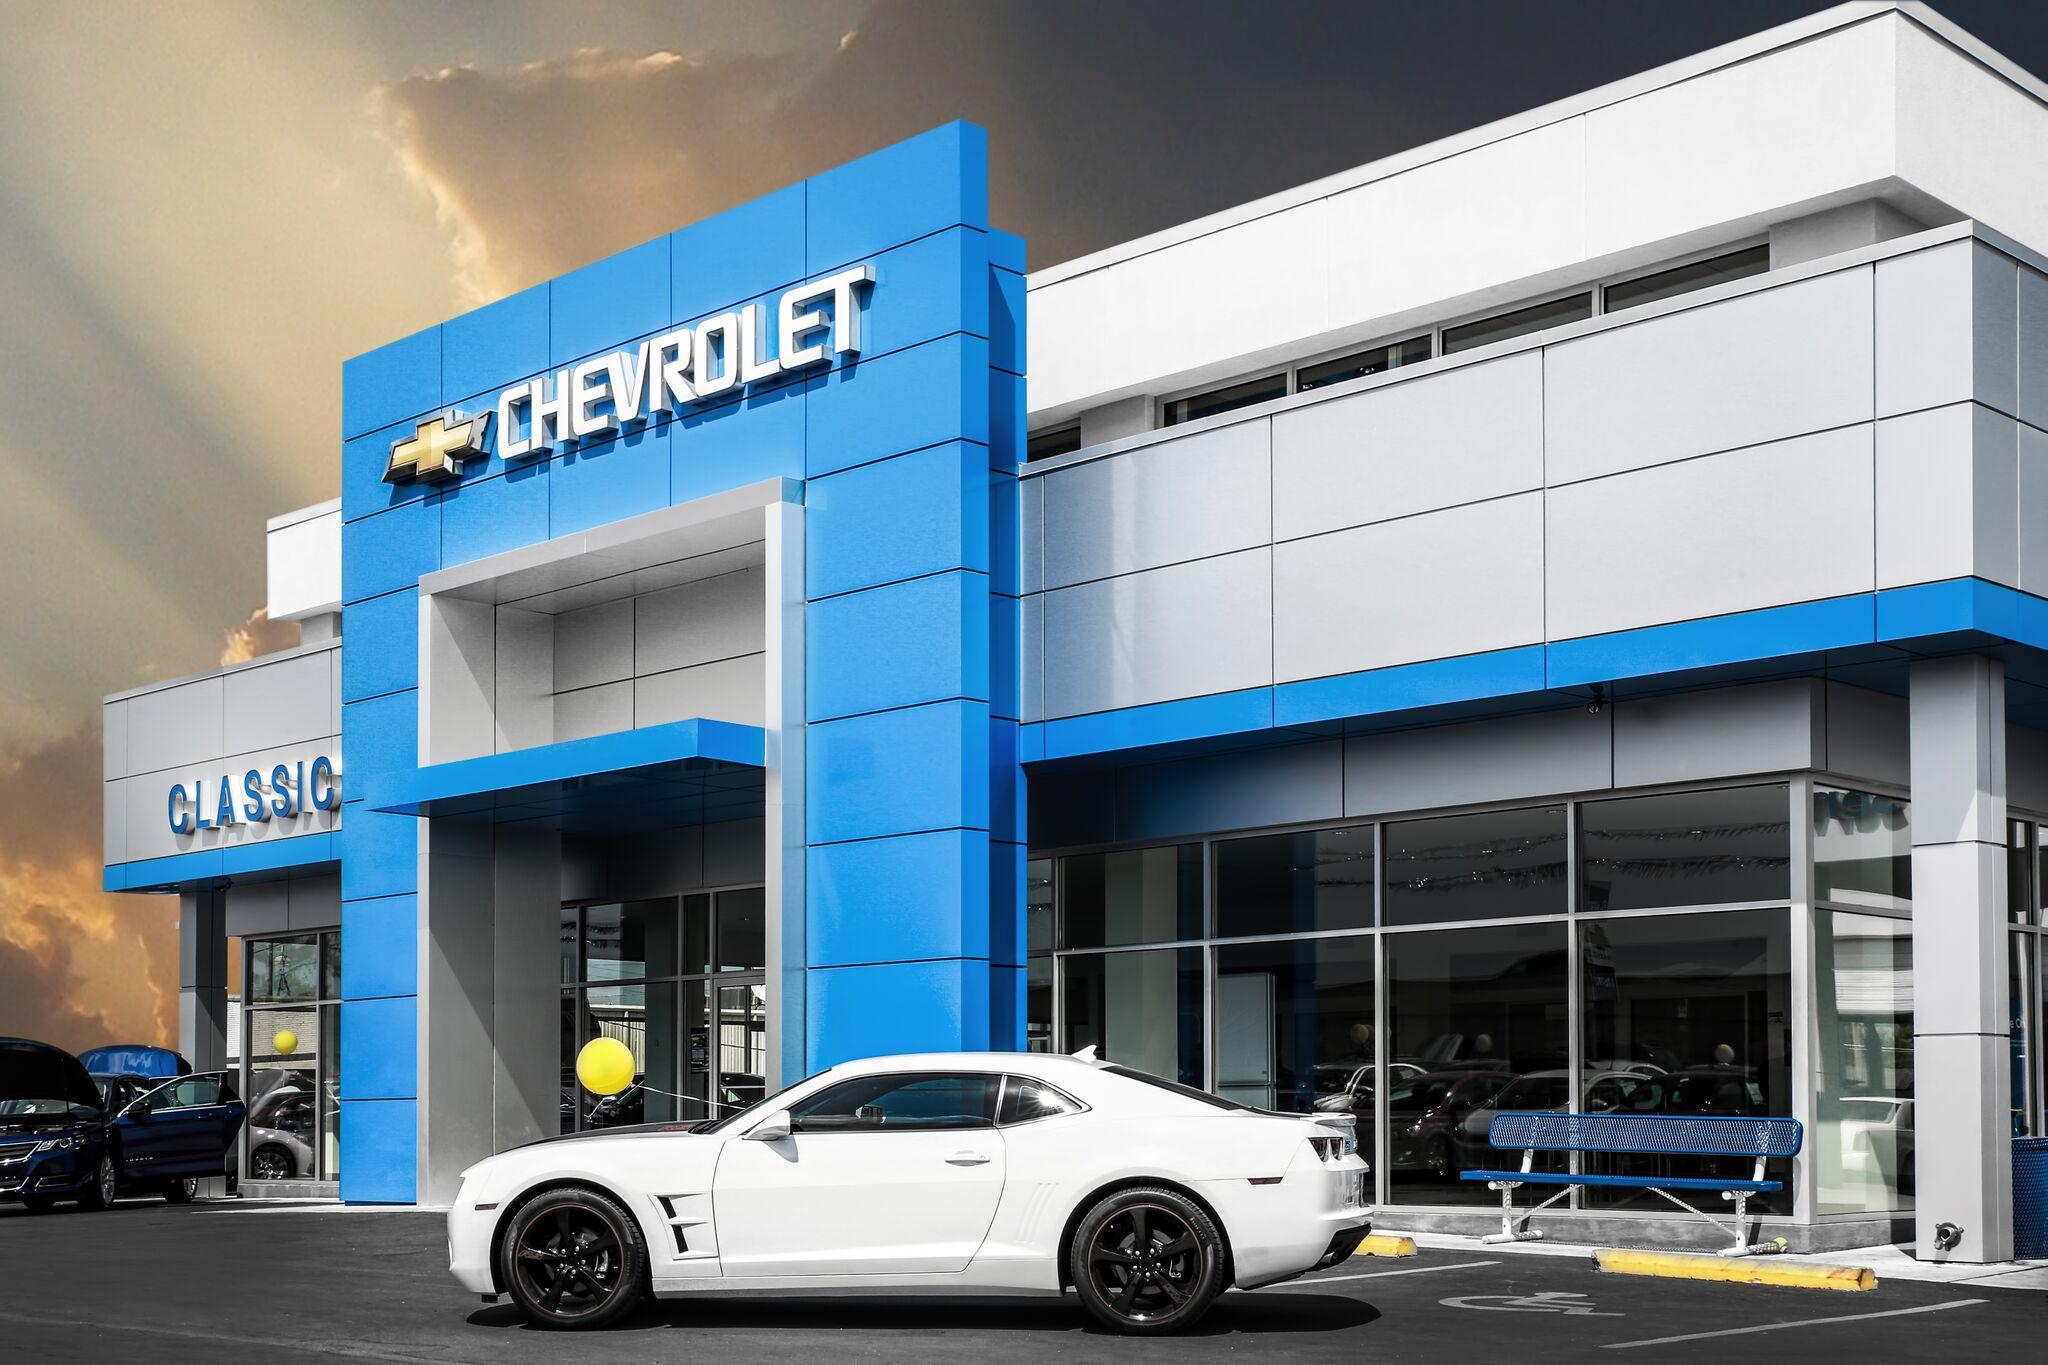 Classic Chevrolet -